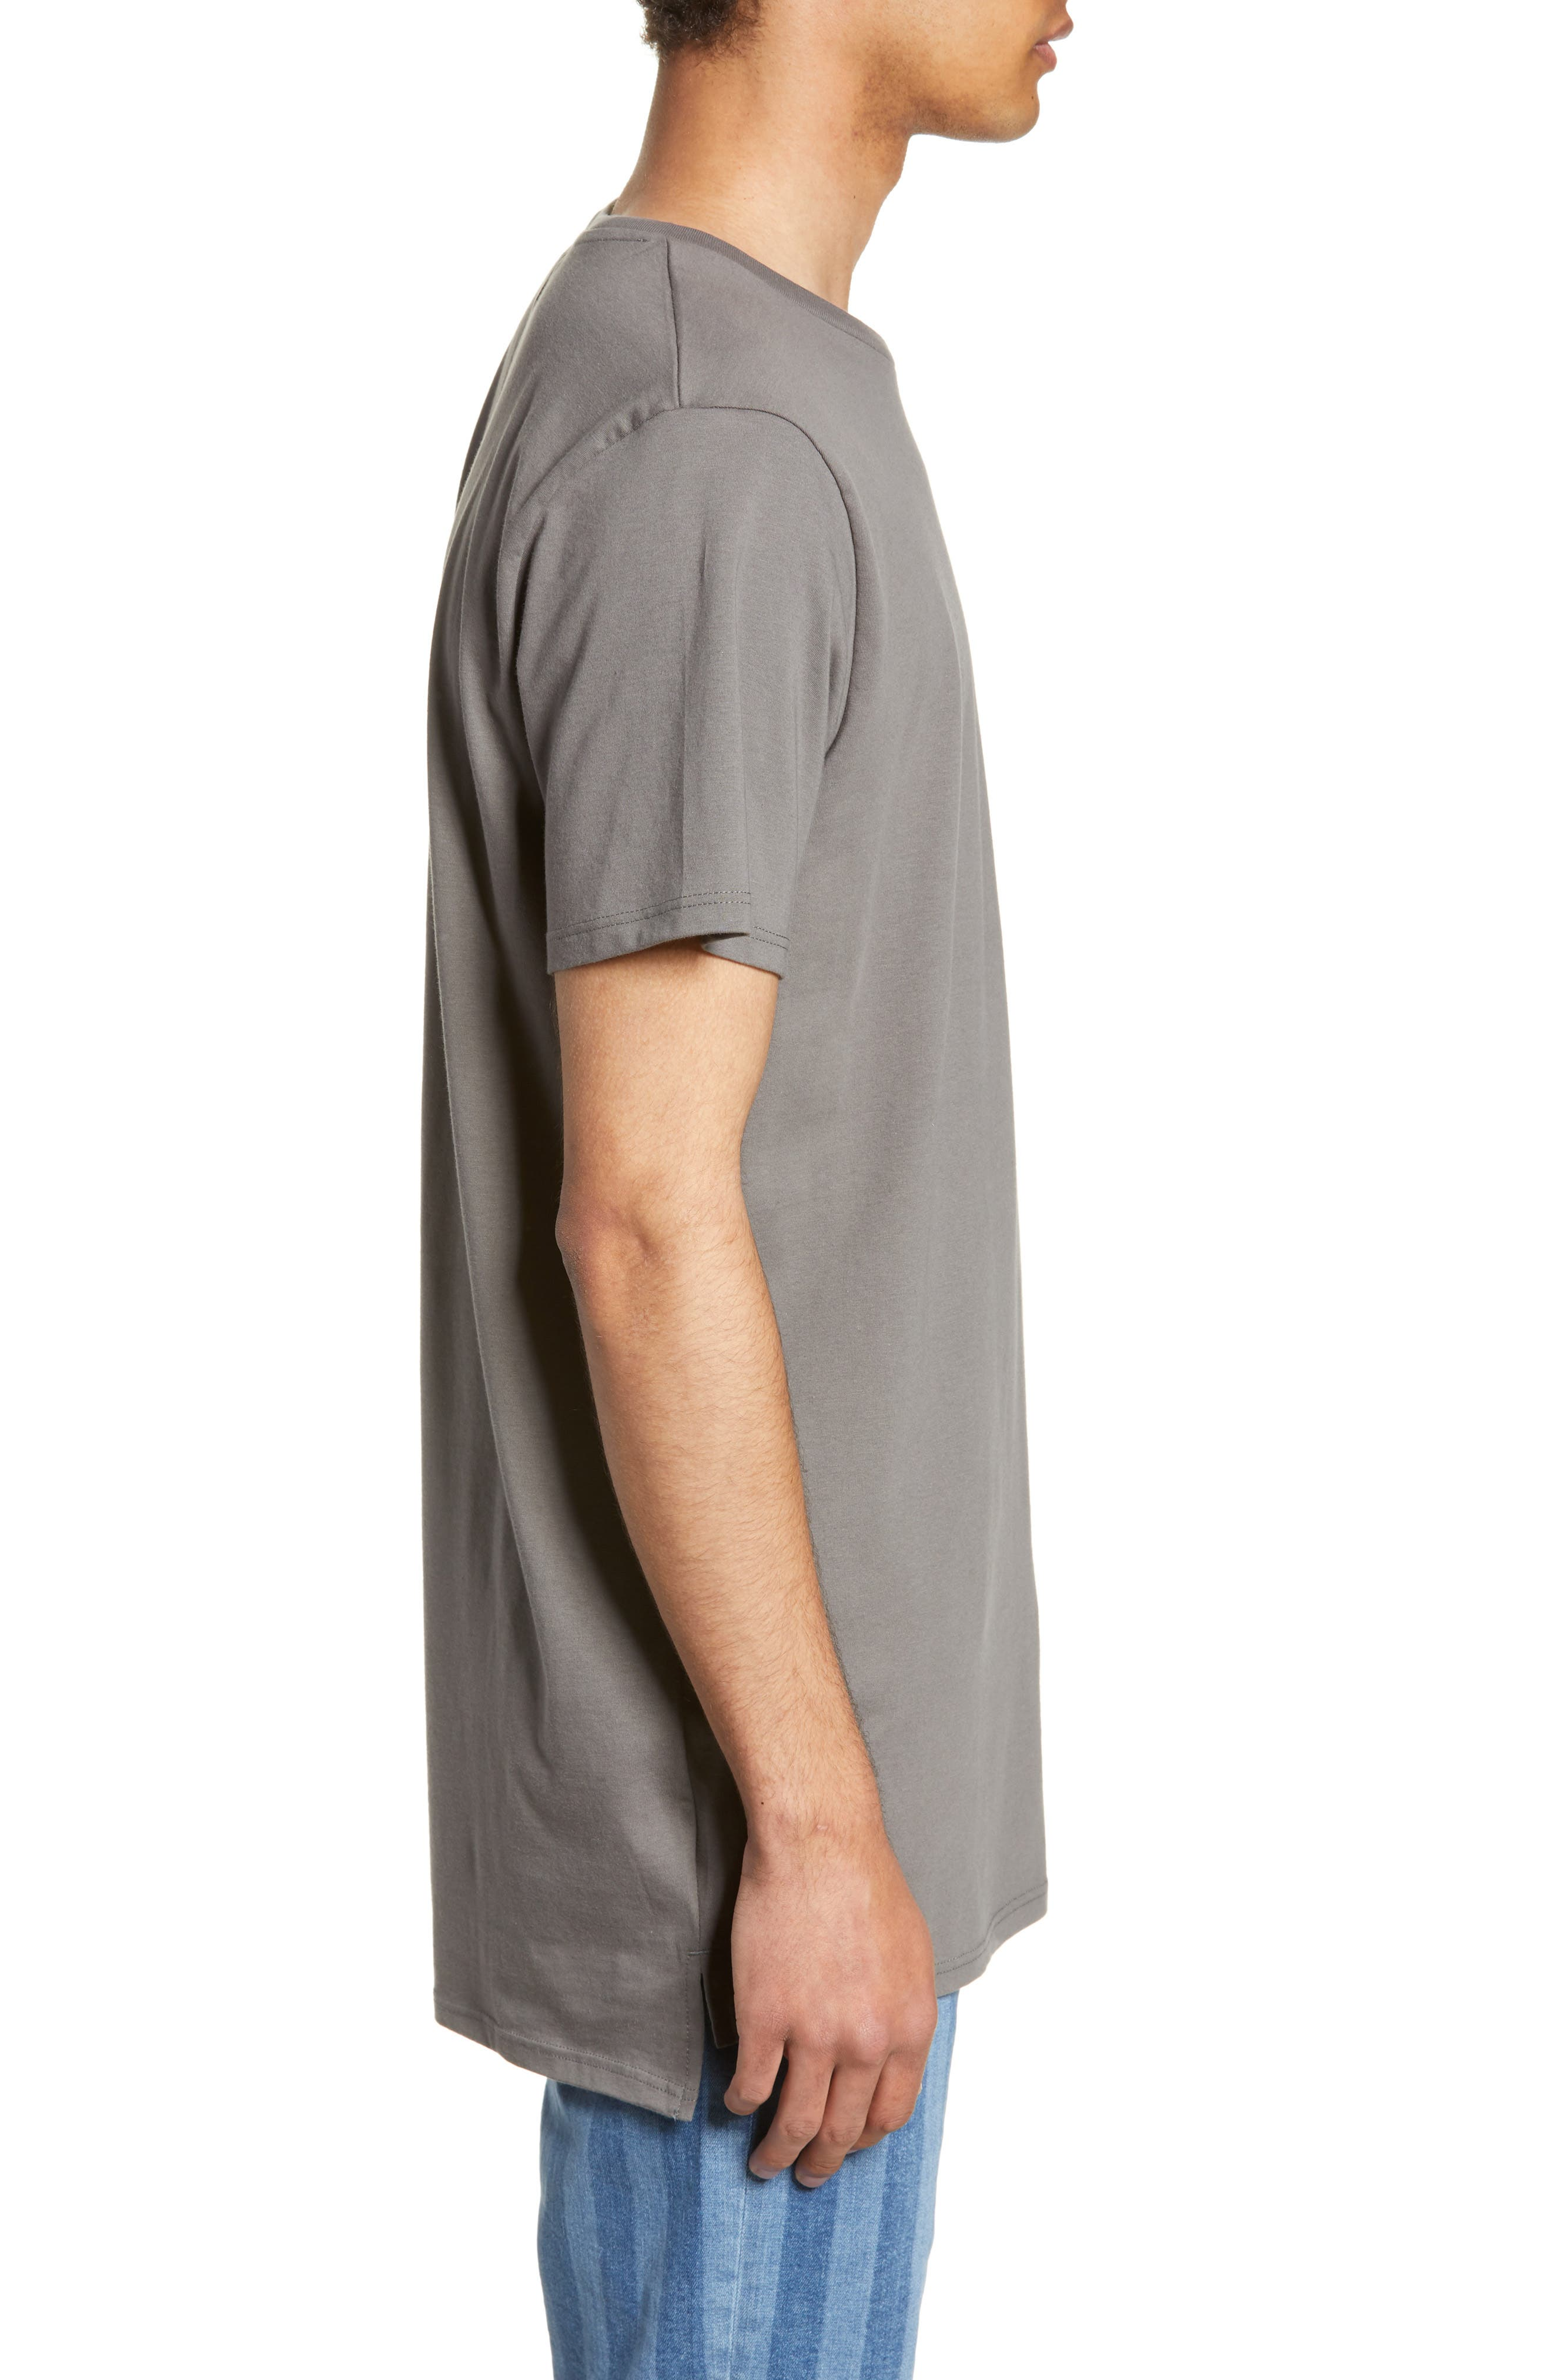 TOPMAN, Longline T-Shirt, Alternate thumbnail 3, color, GREY